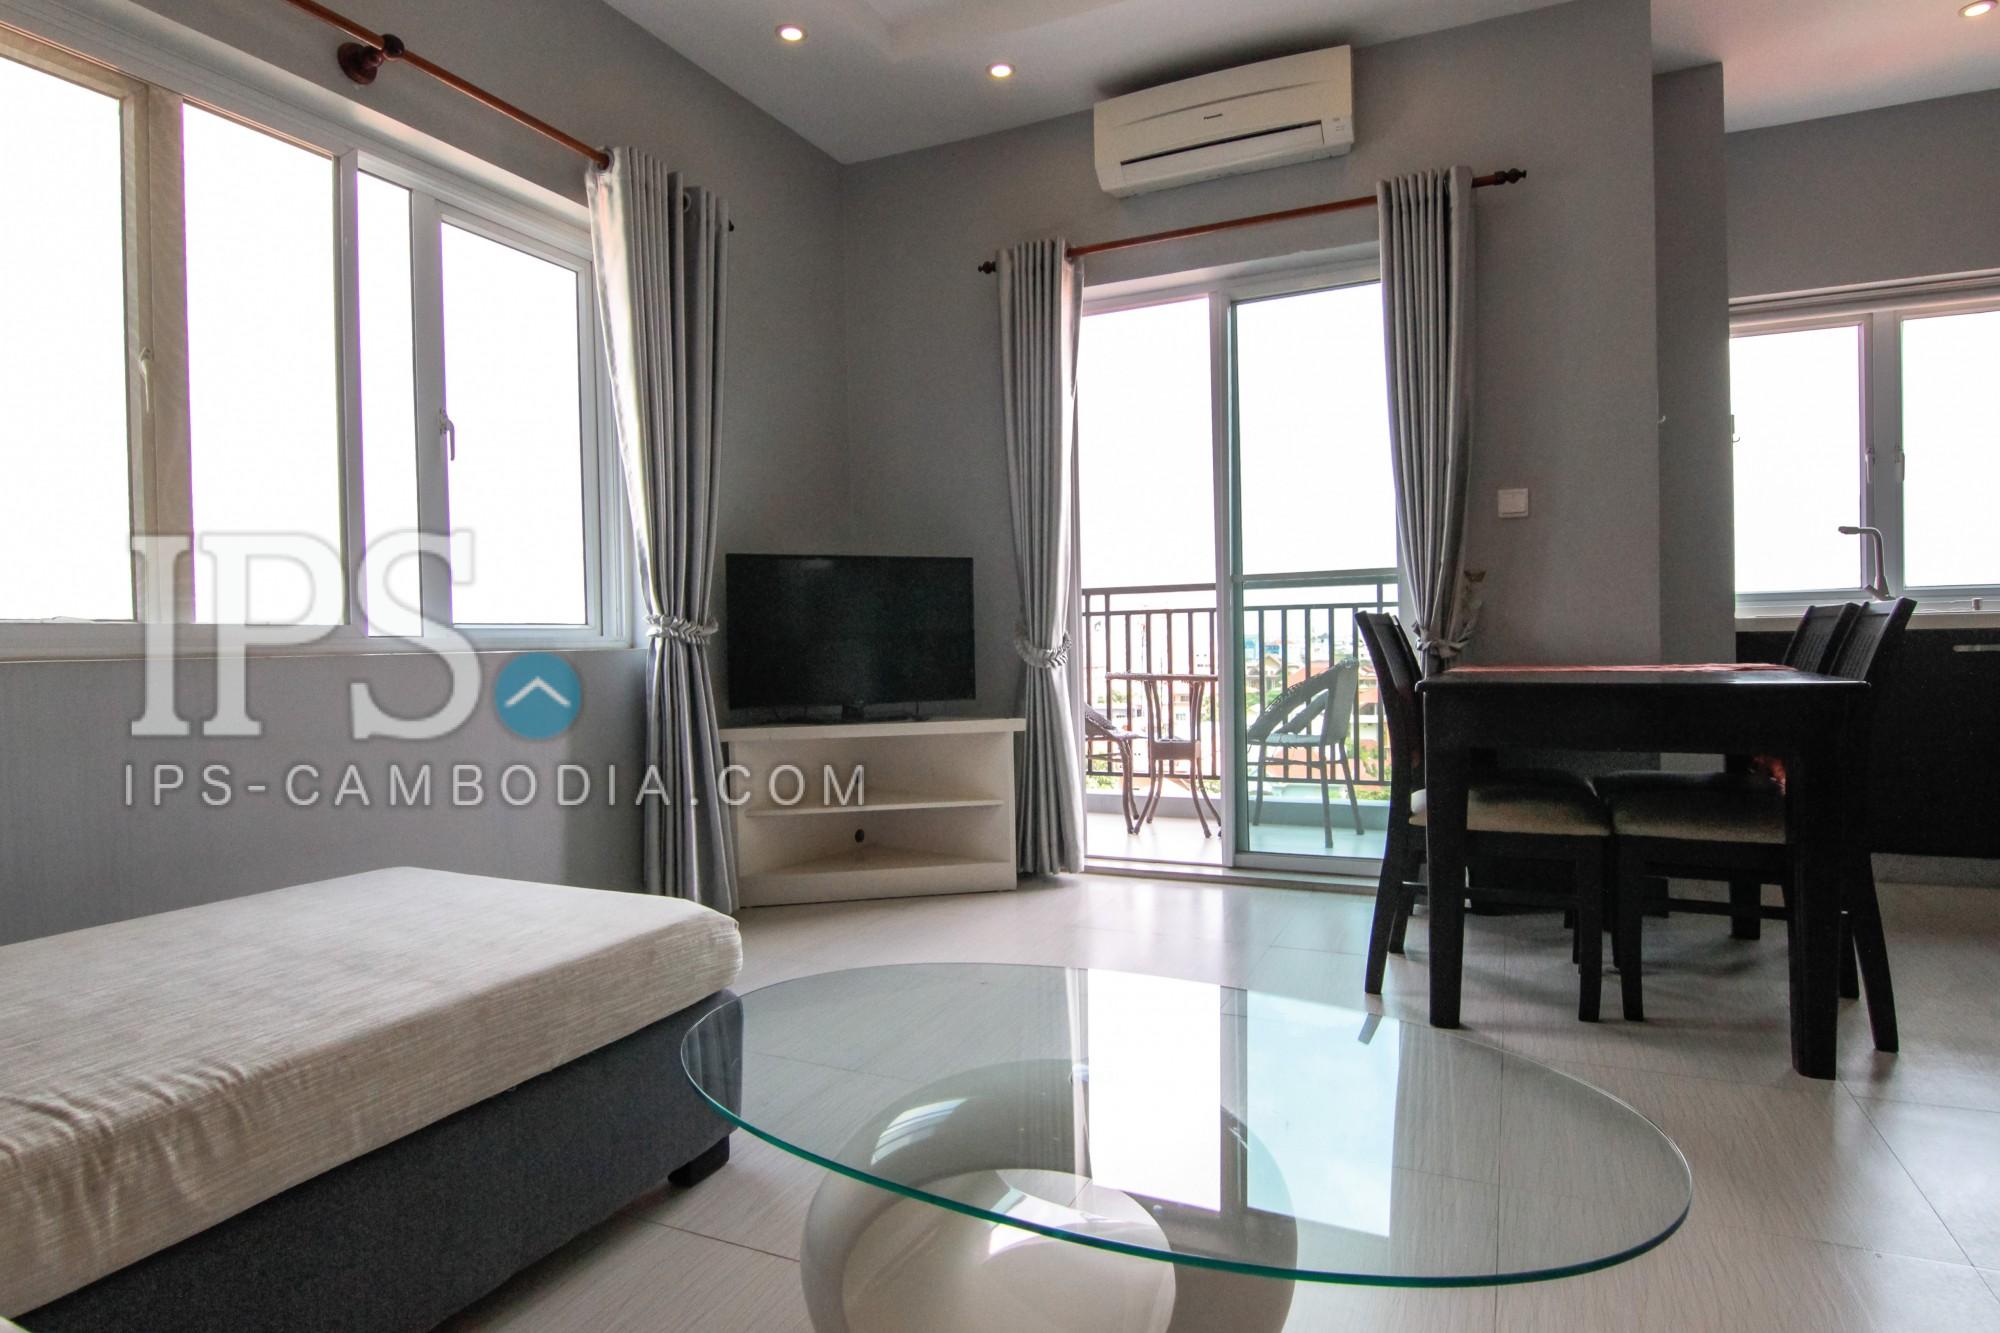 Apartment Building For Sale - Phsar Daeum Thkov, Phnom Penh